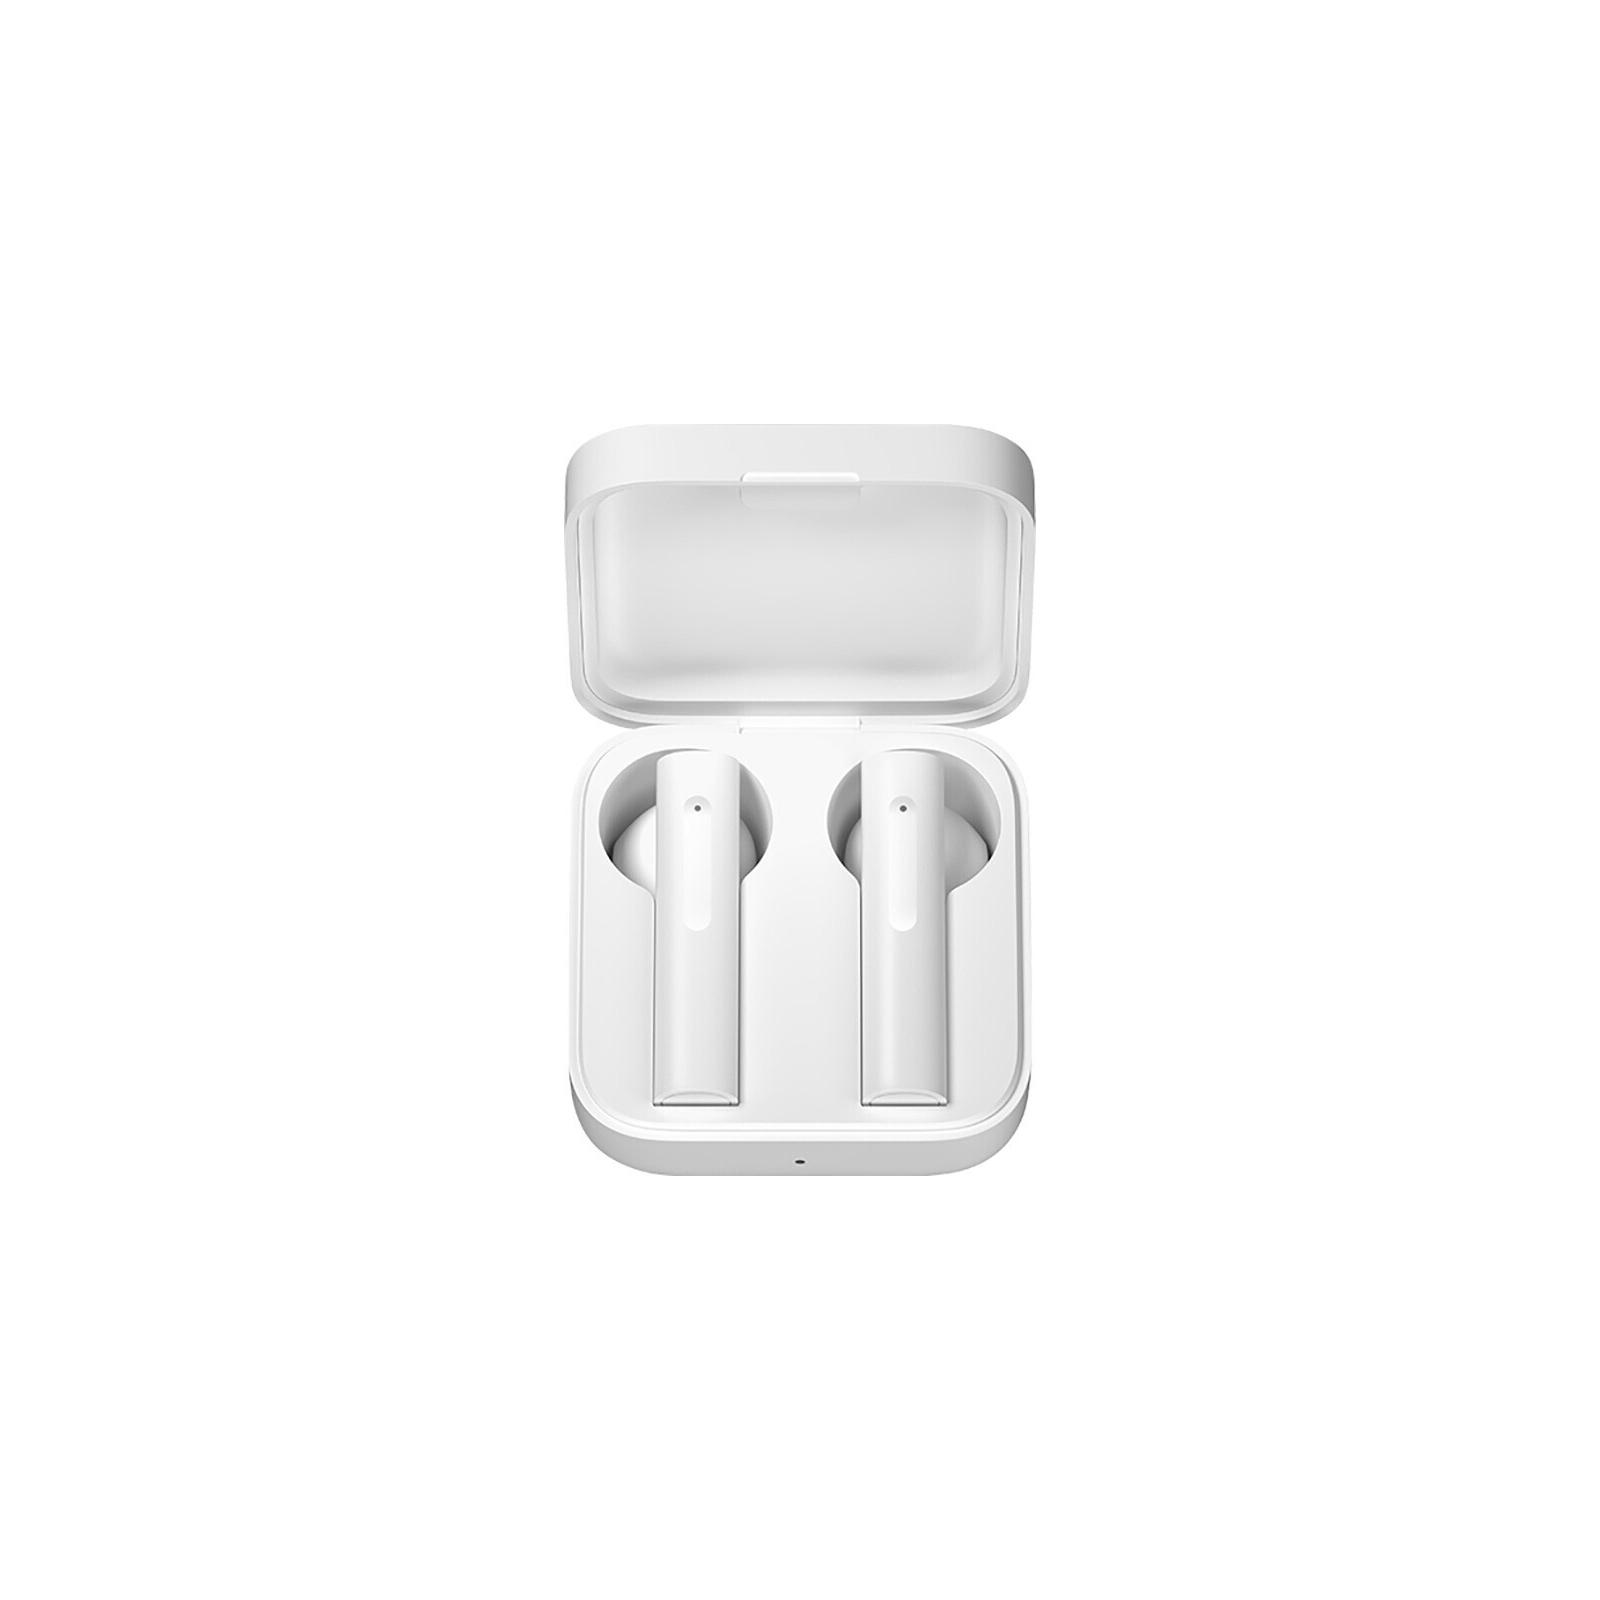 Навушники Xiaomi Mi True Wireless Earphones 2 Basic White зображення 3